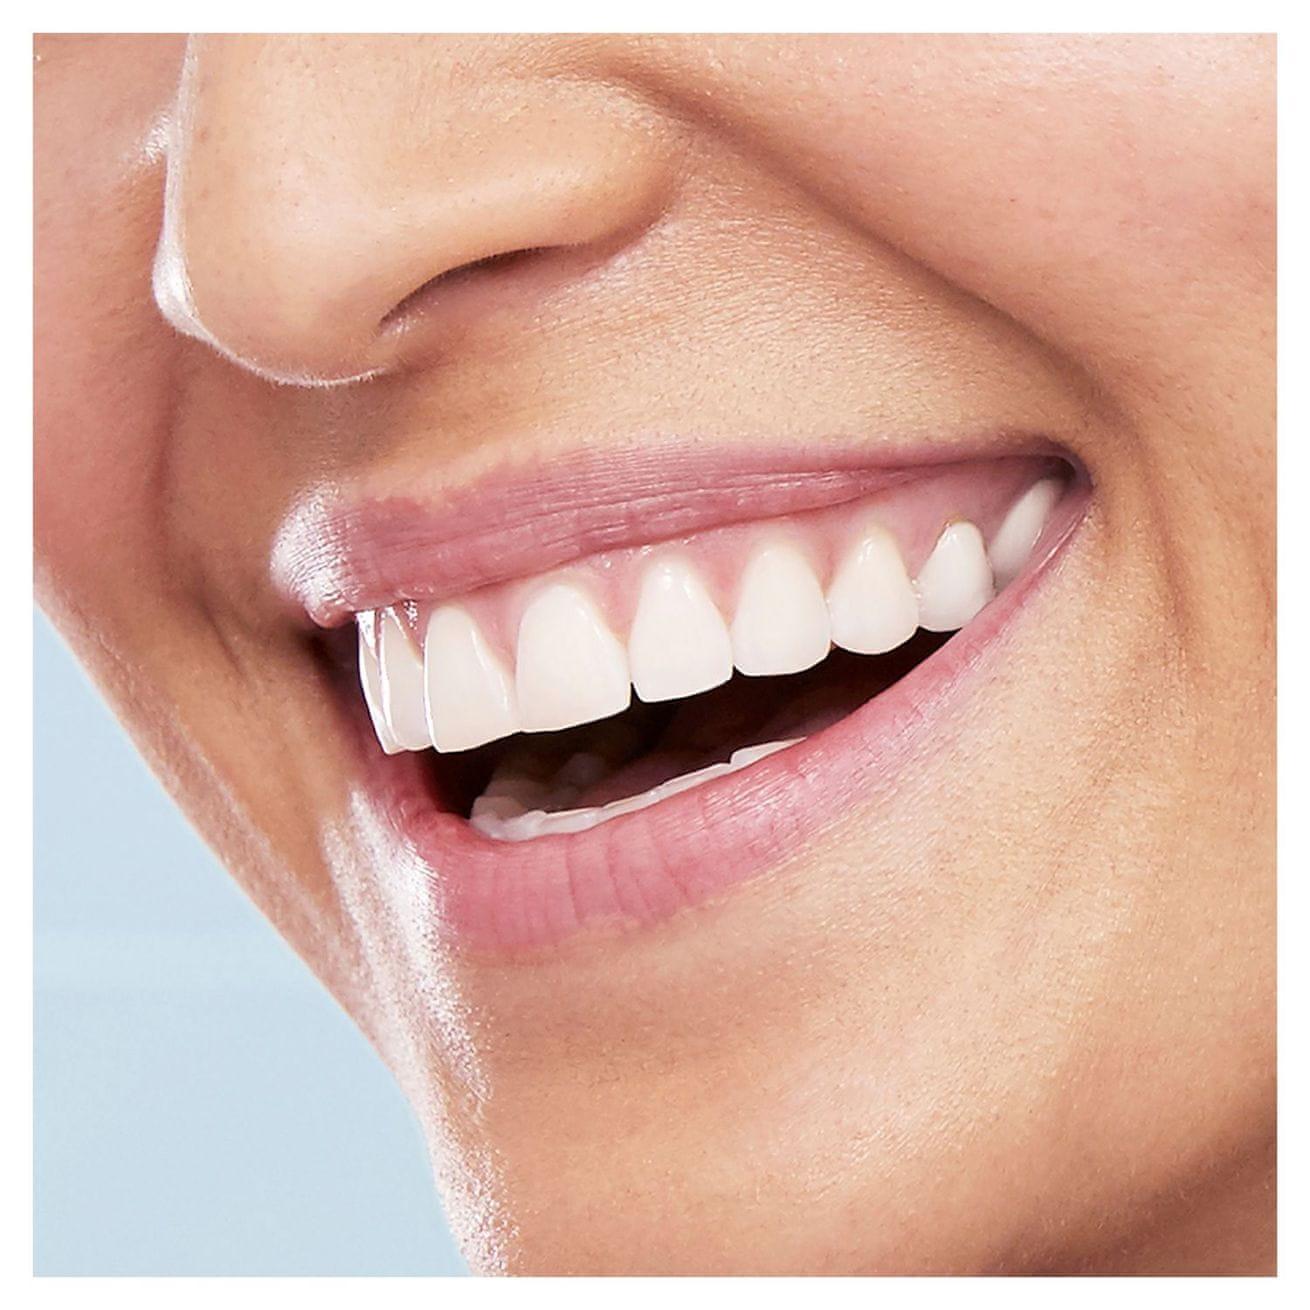 Oral-B Pro 2 Sensi Ultra Thin White Handle